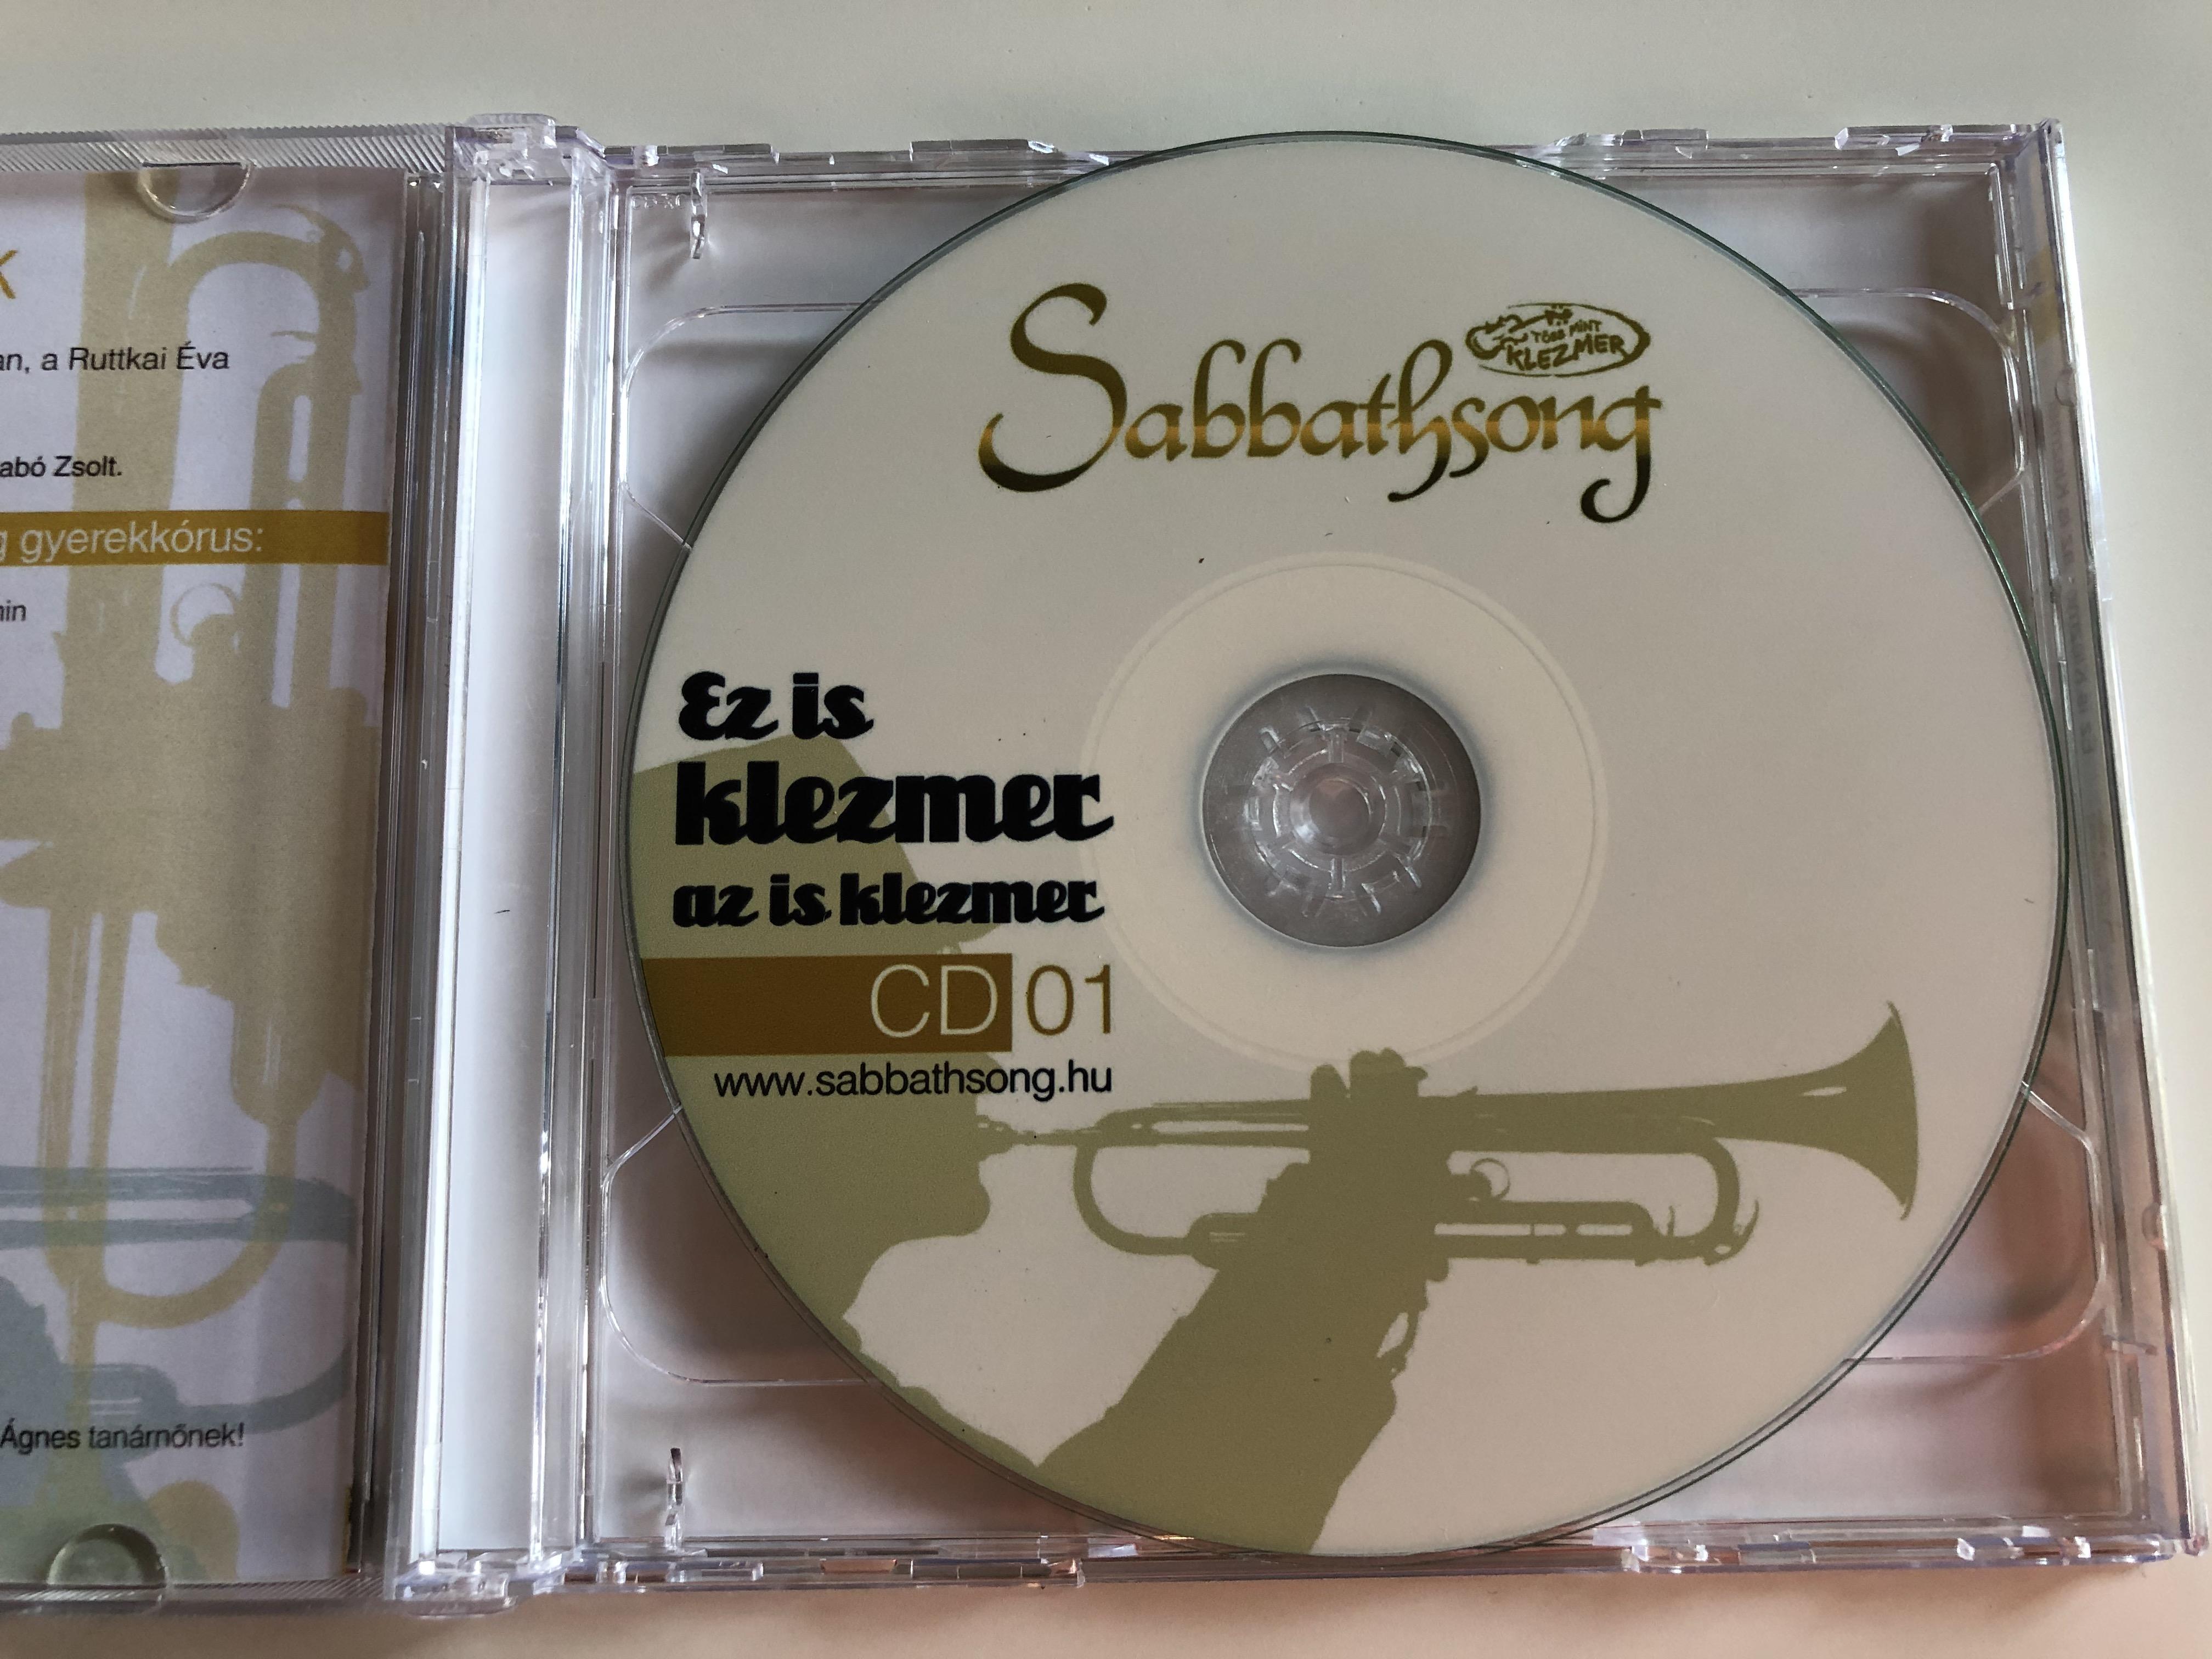 ez-is-klezmer-az-is-klezmer-sabbathsong-hebrew-song-yiddish-songs-4.jpg